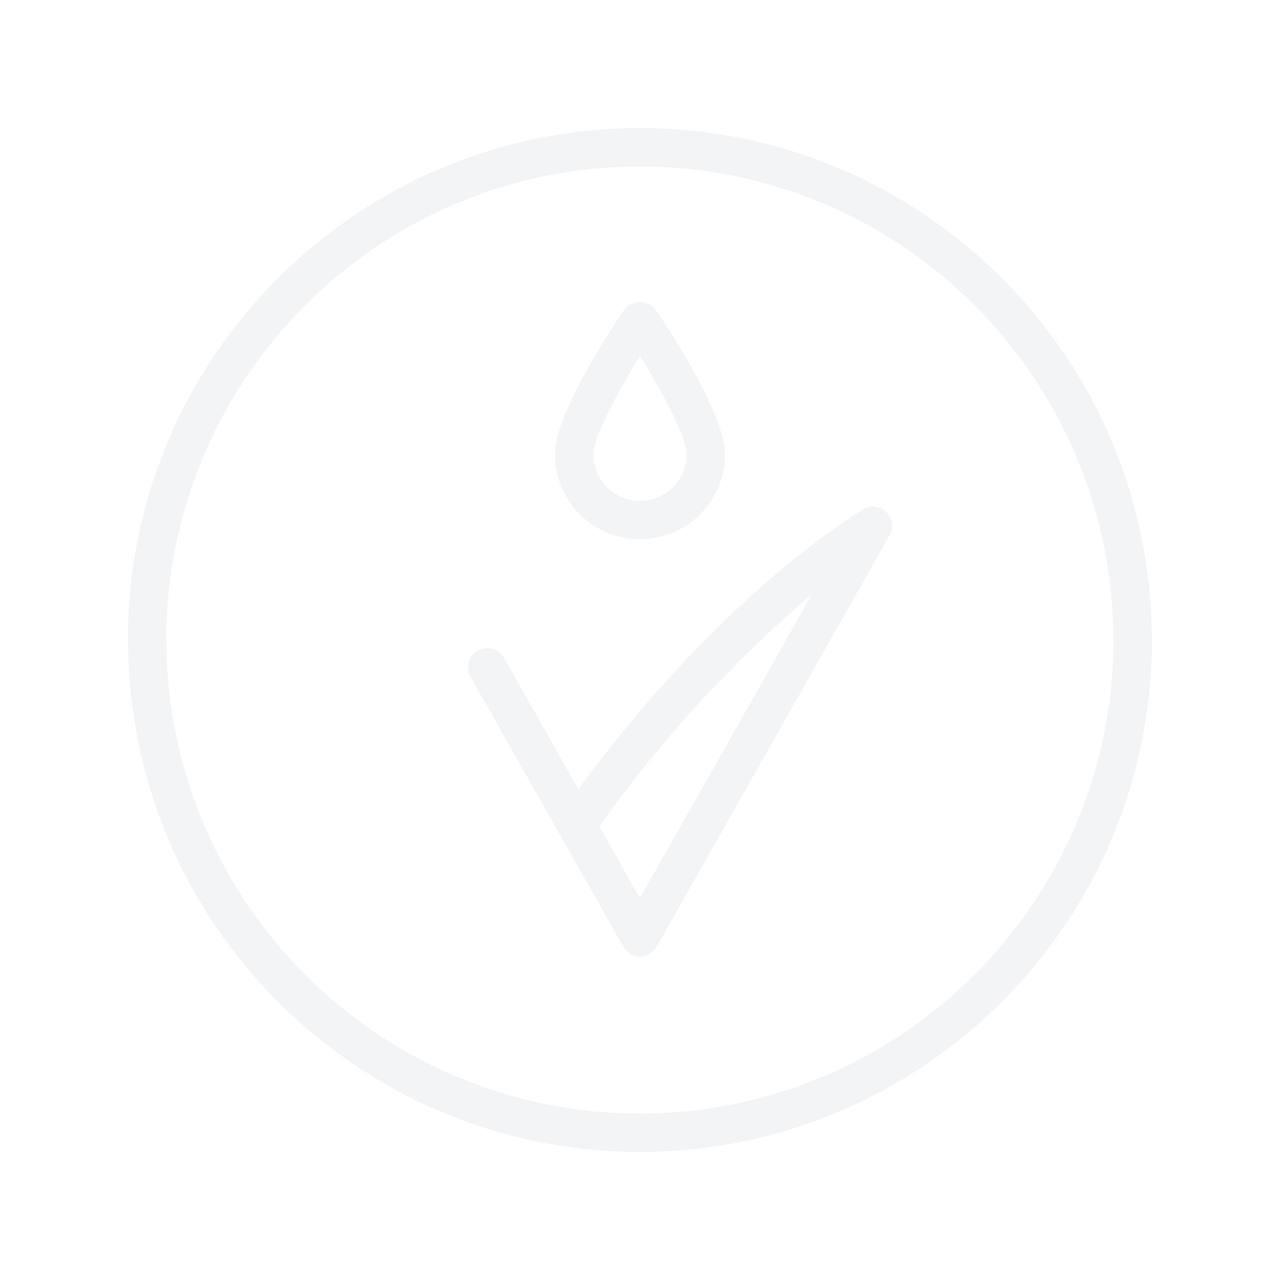 HOLIKA HOLIKA Cherry Blossom Body Cleanser очищающее средство для тела 390ml